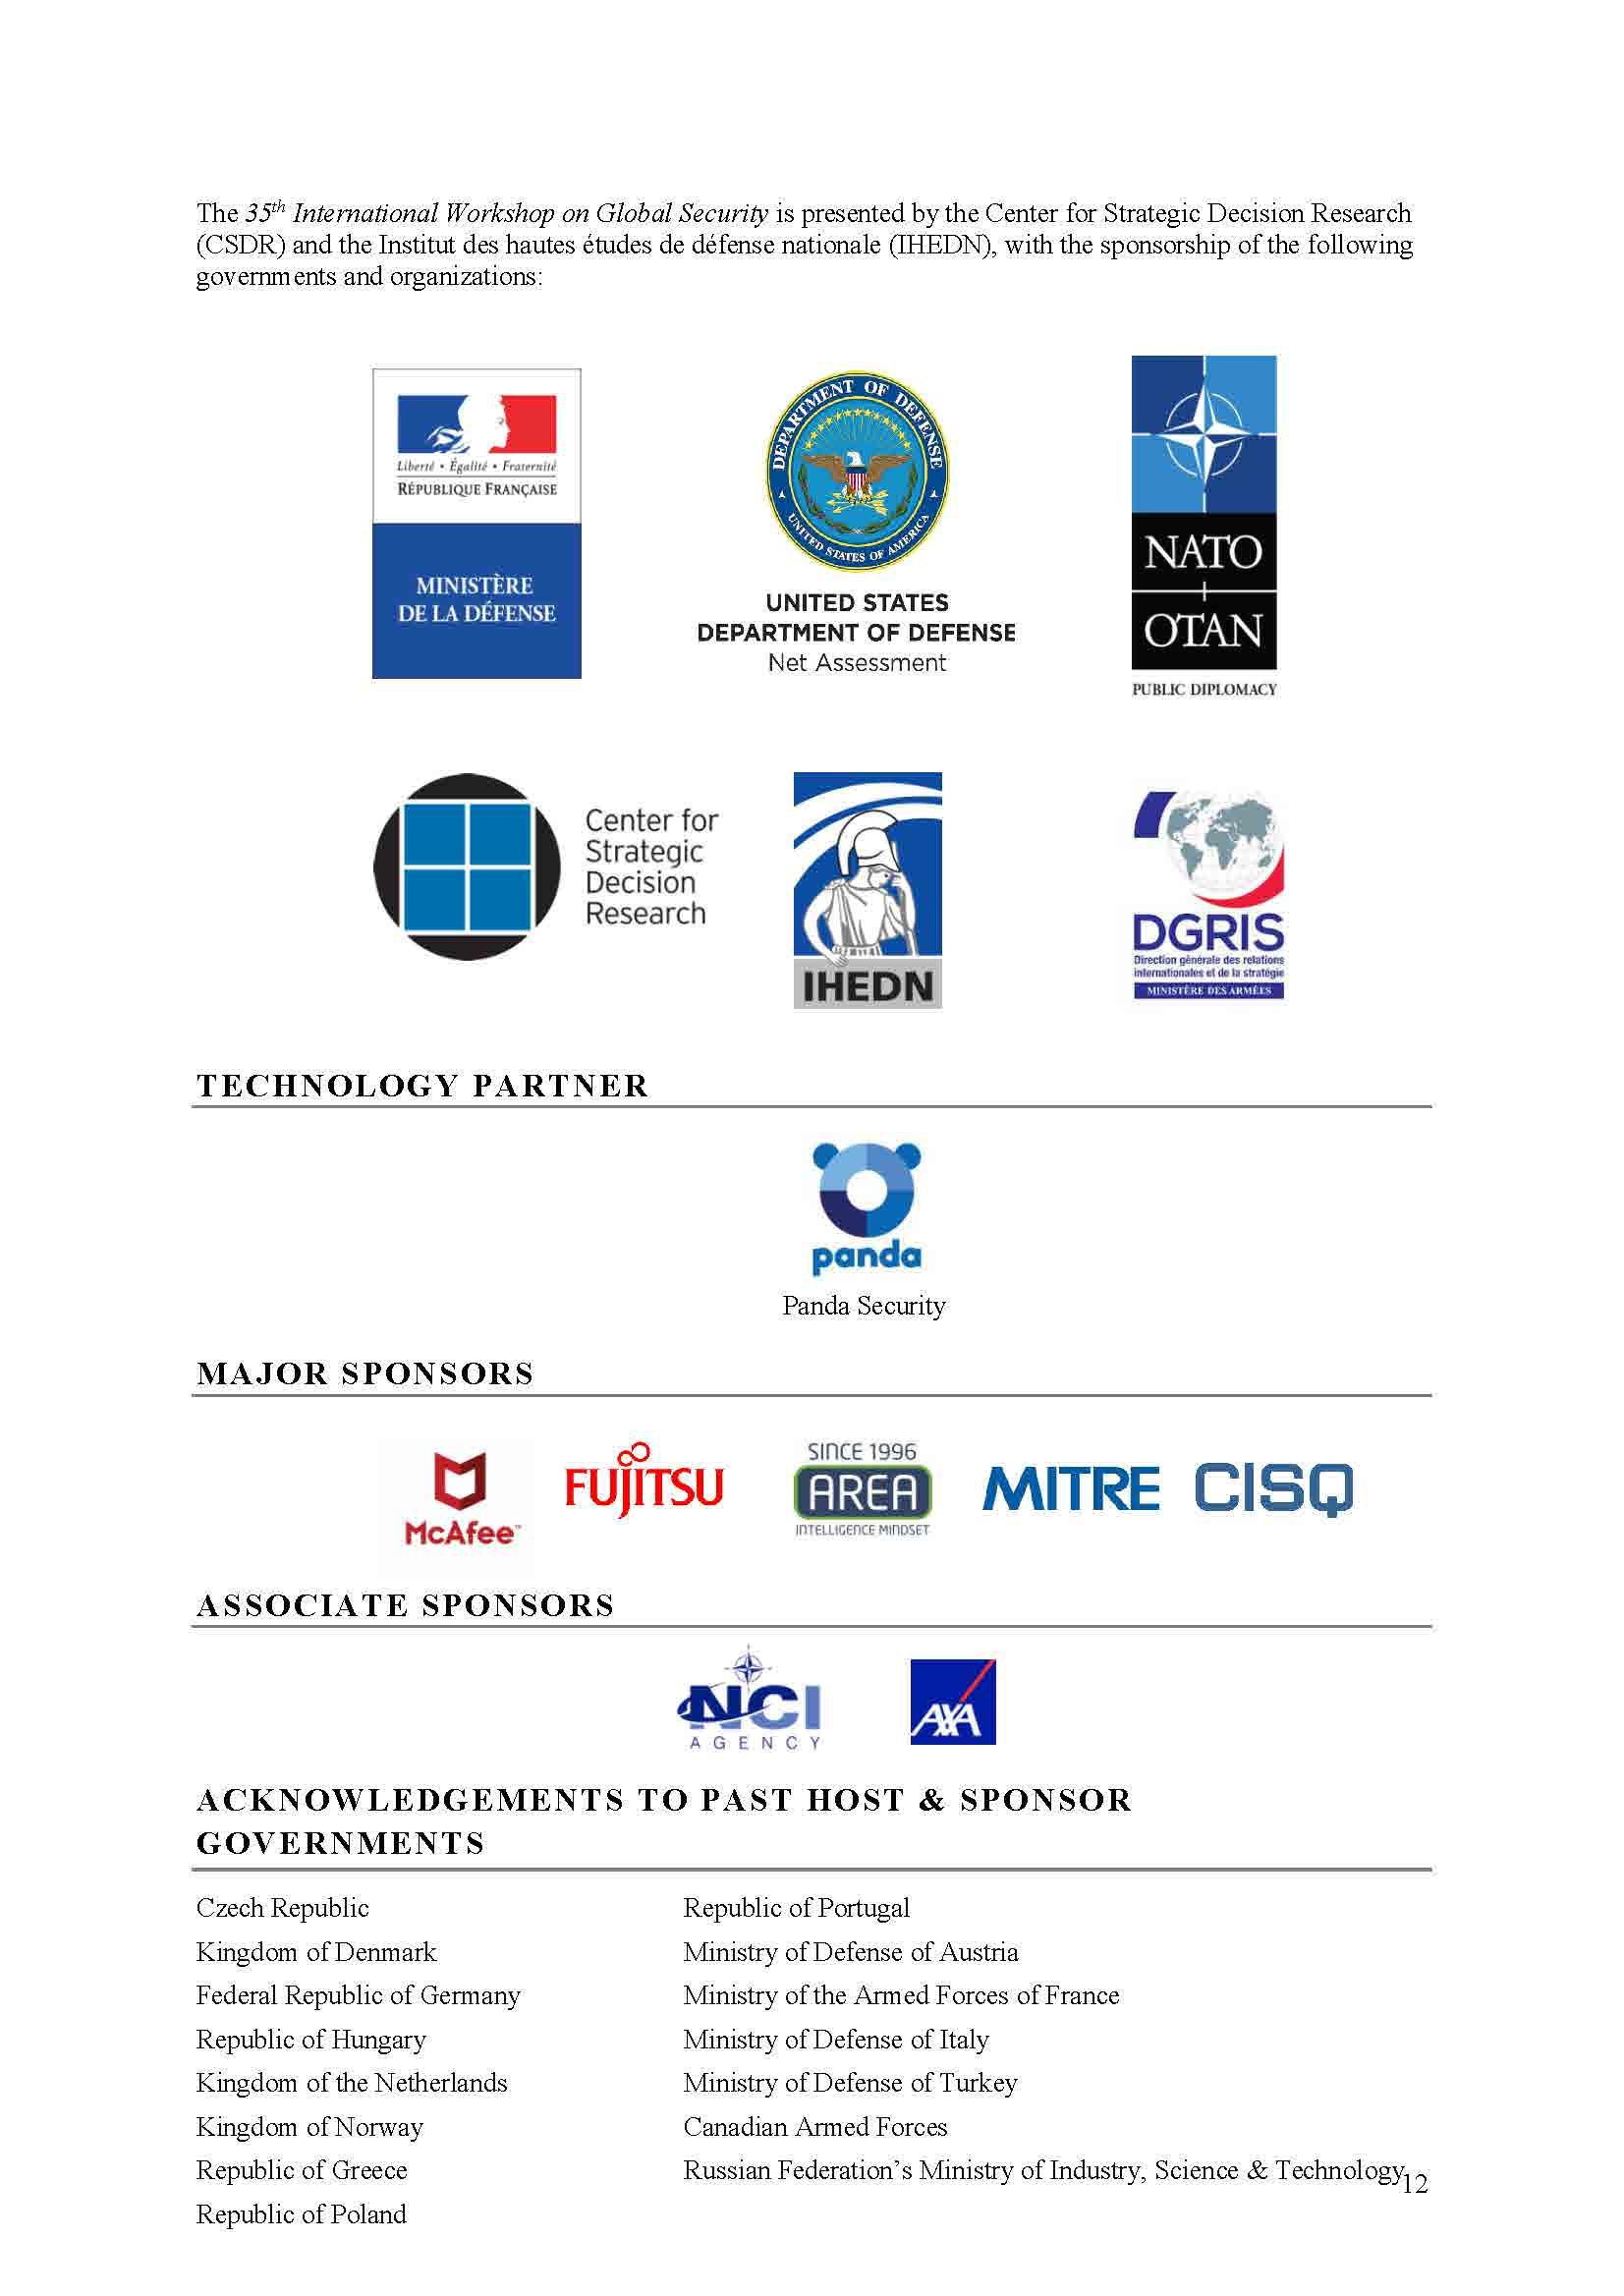 CSDR: Center for Strategic Decision Research - Centre d